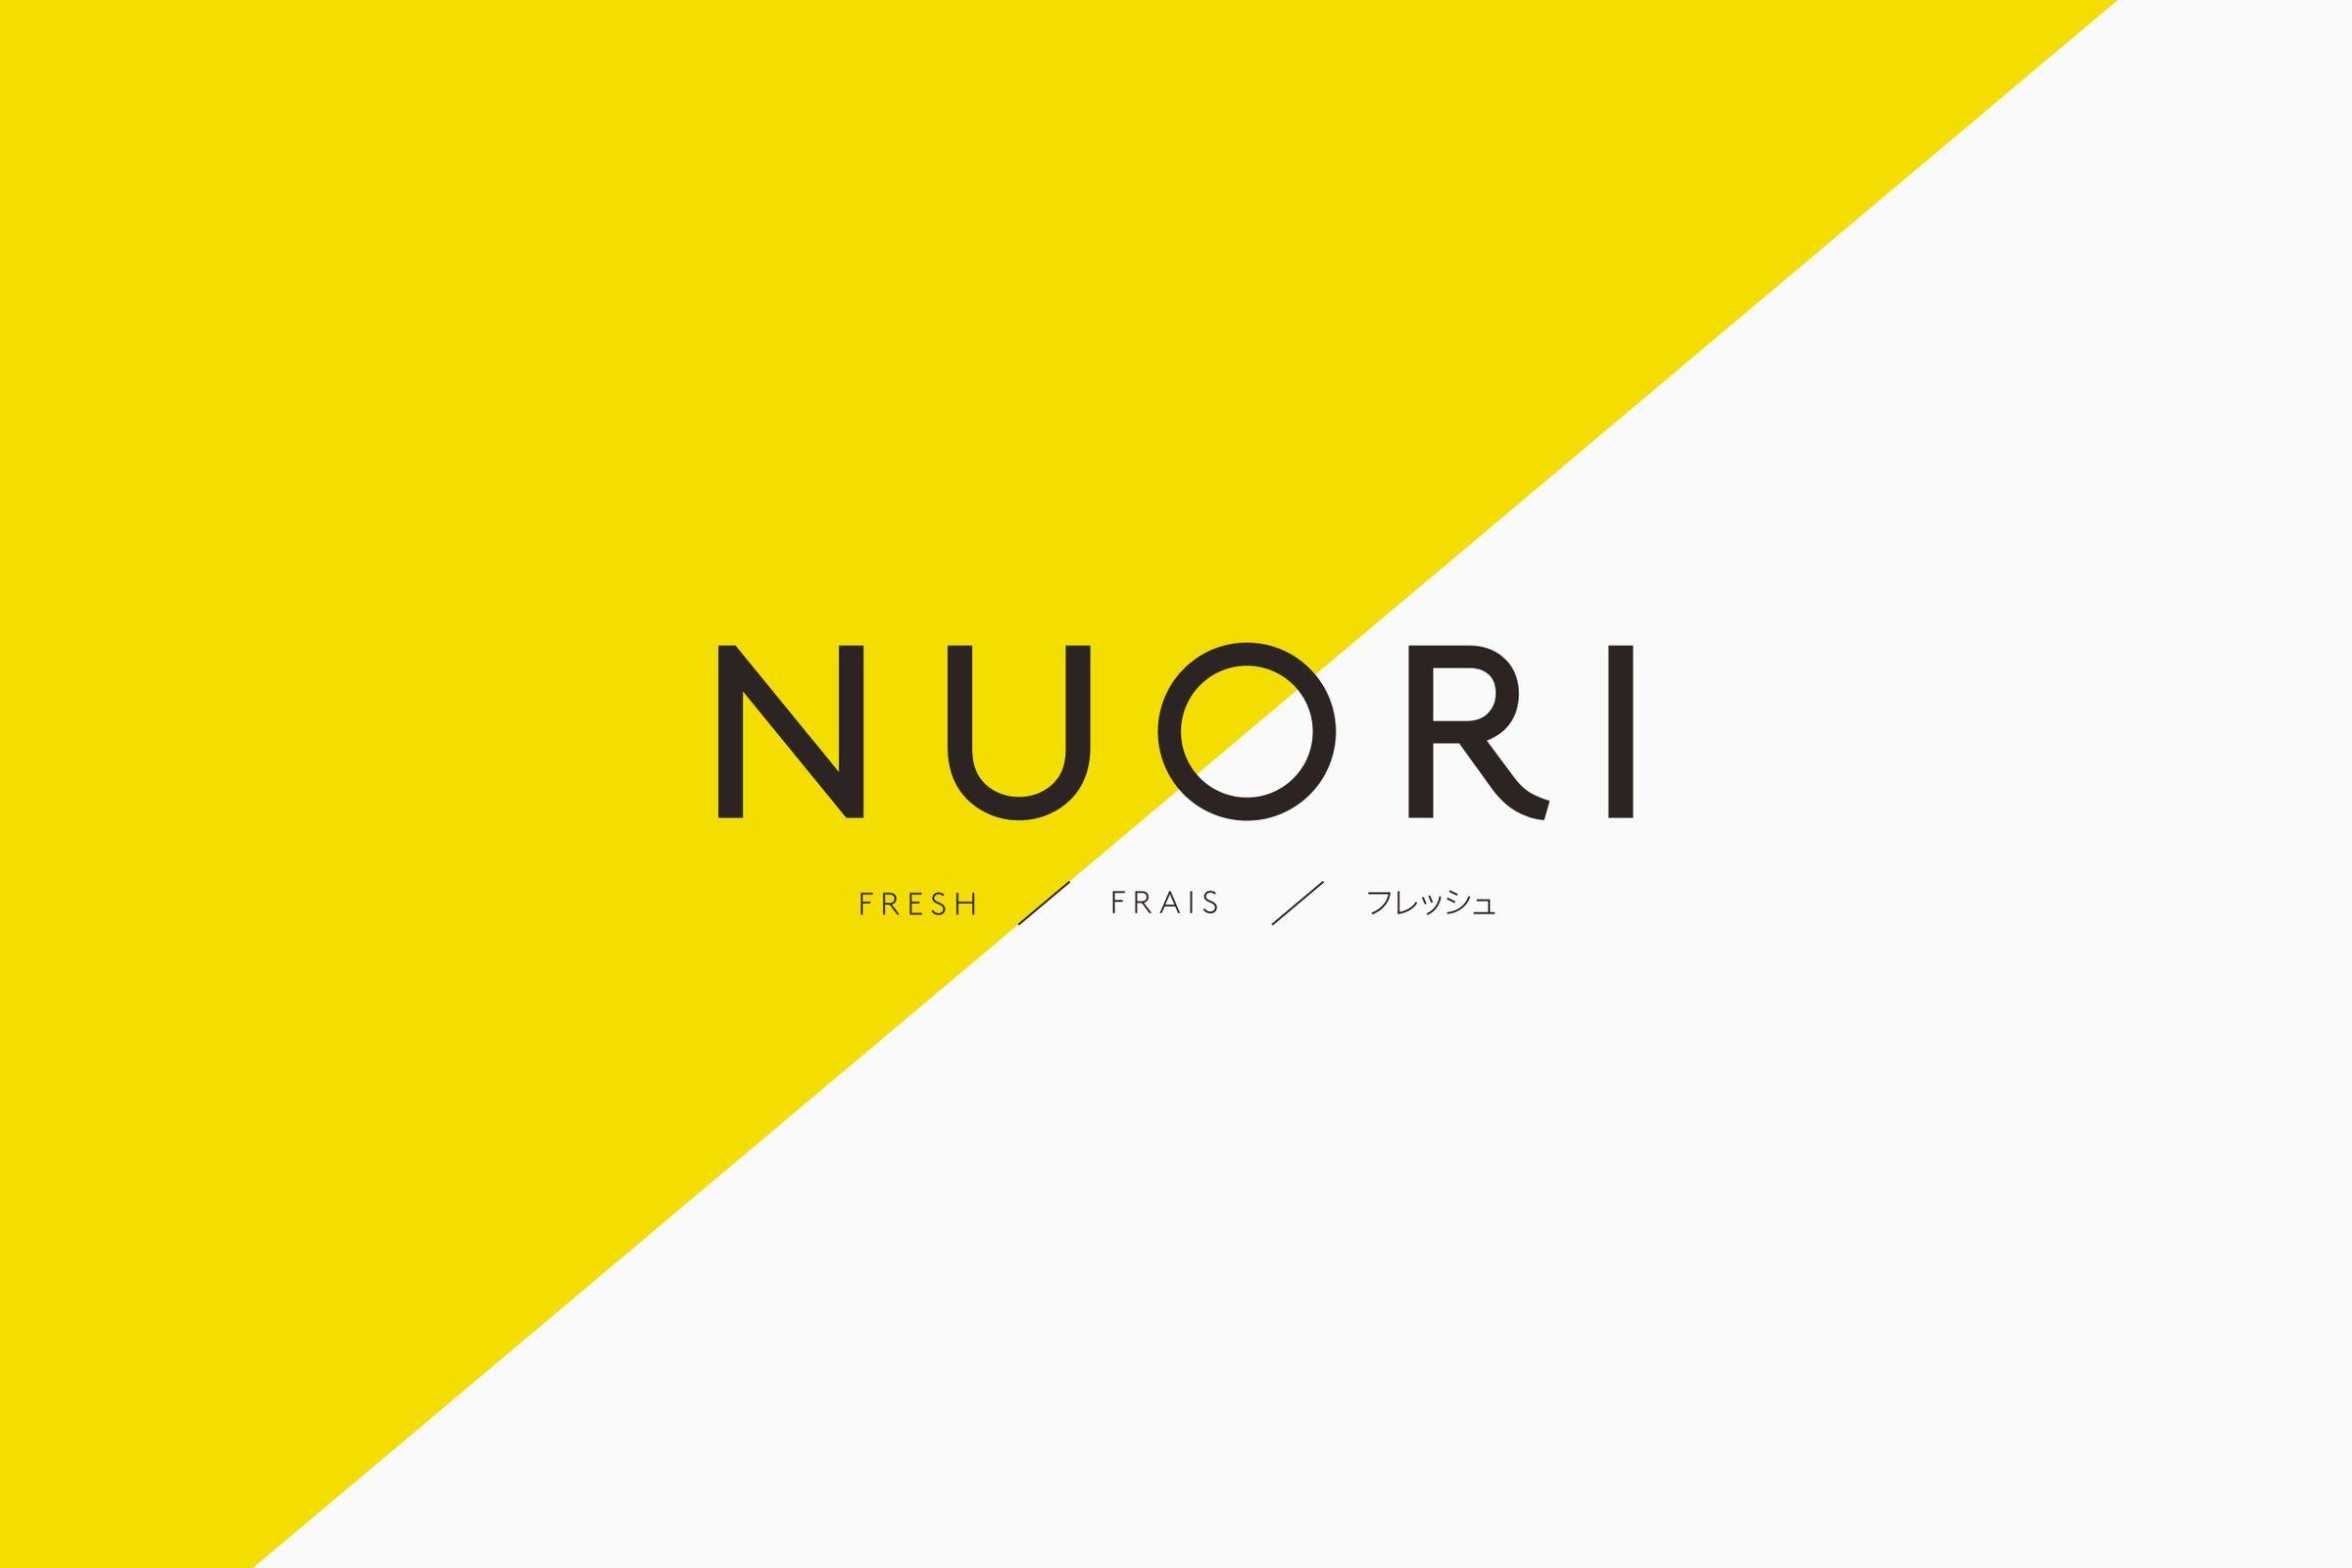 Nuori logo design